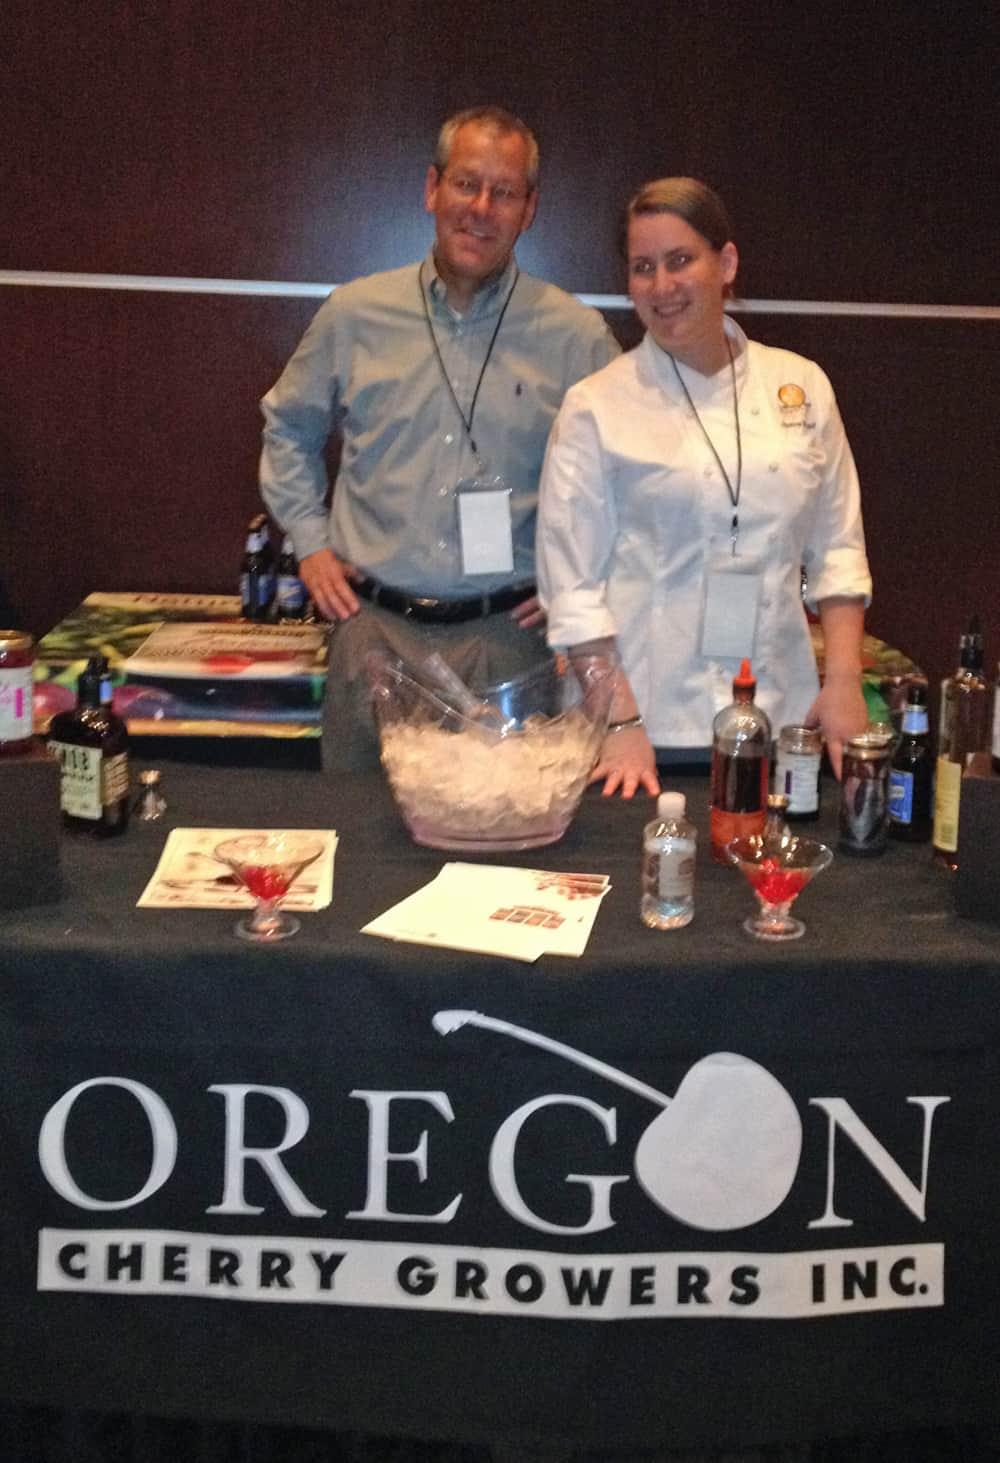 WhiskeyFest 2014 - Oregon Cherries